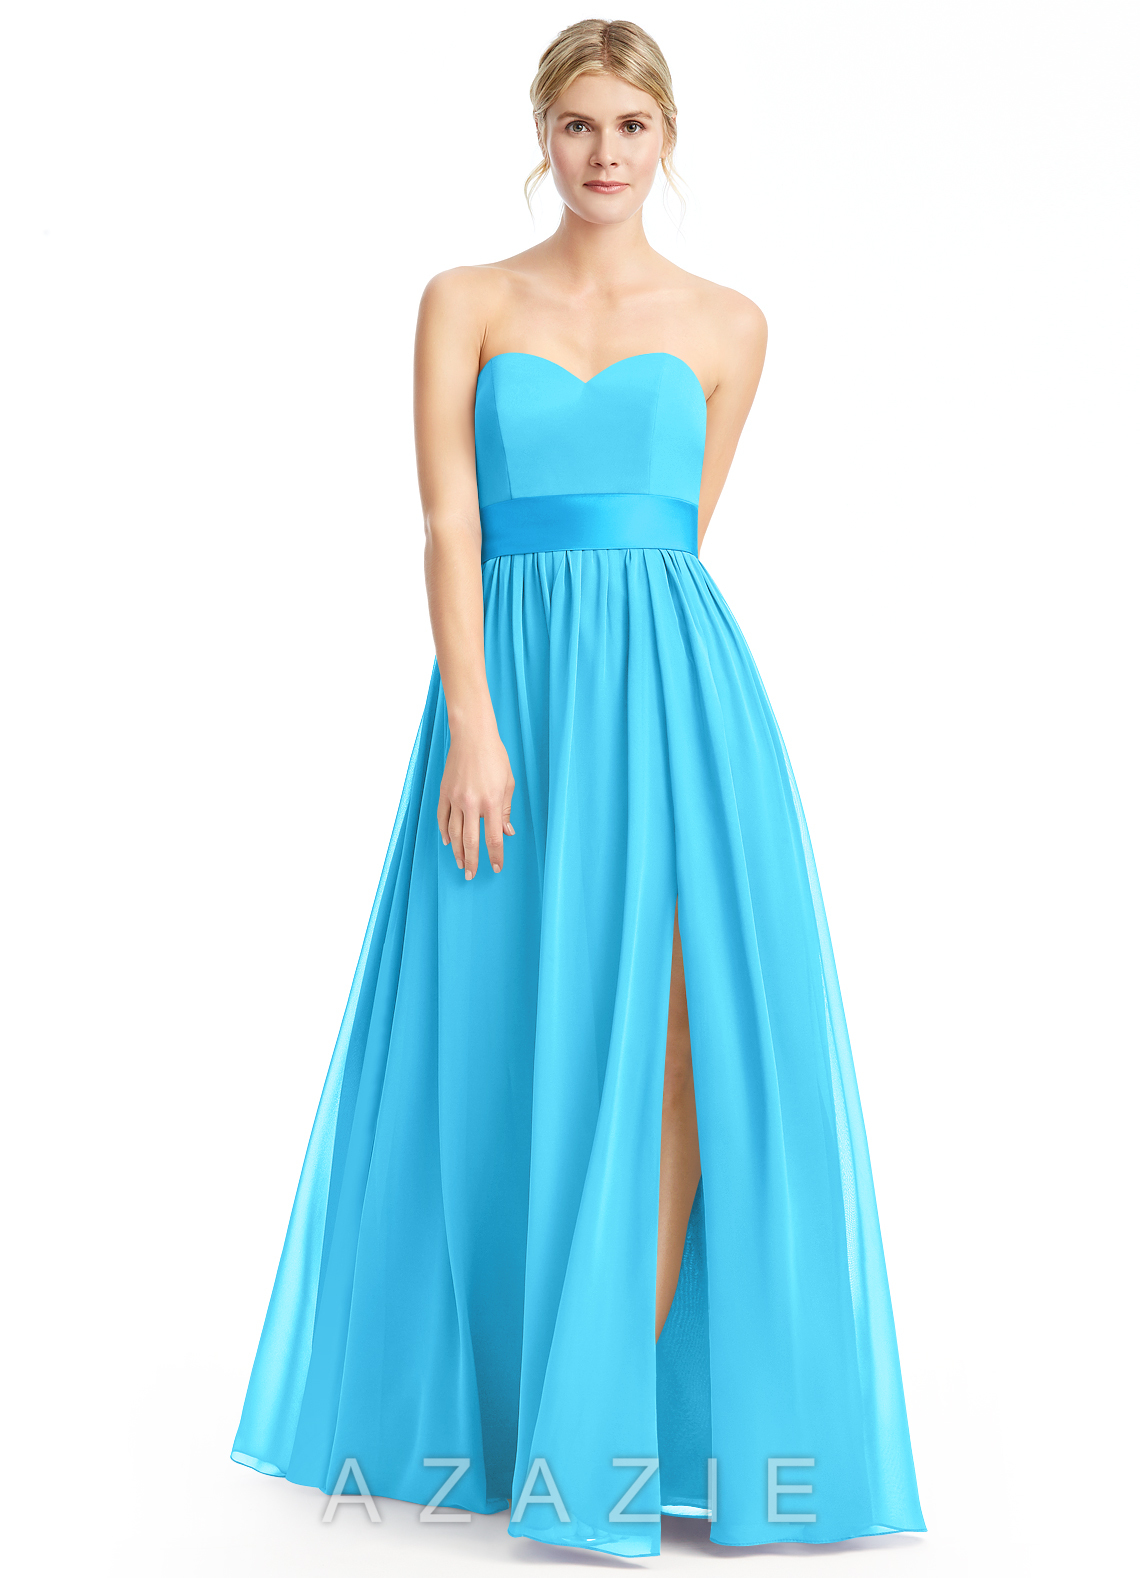 Azazie Fiona Bridesmaid Dress | Azazie - photo #18